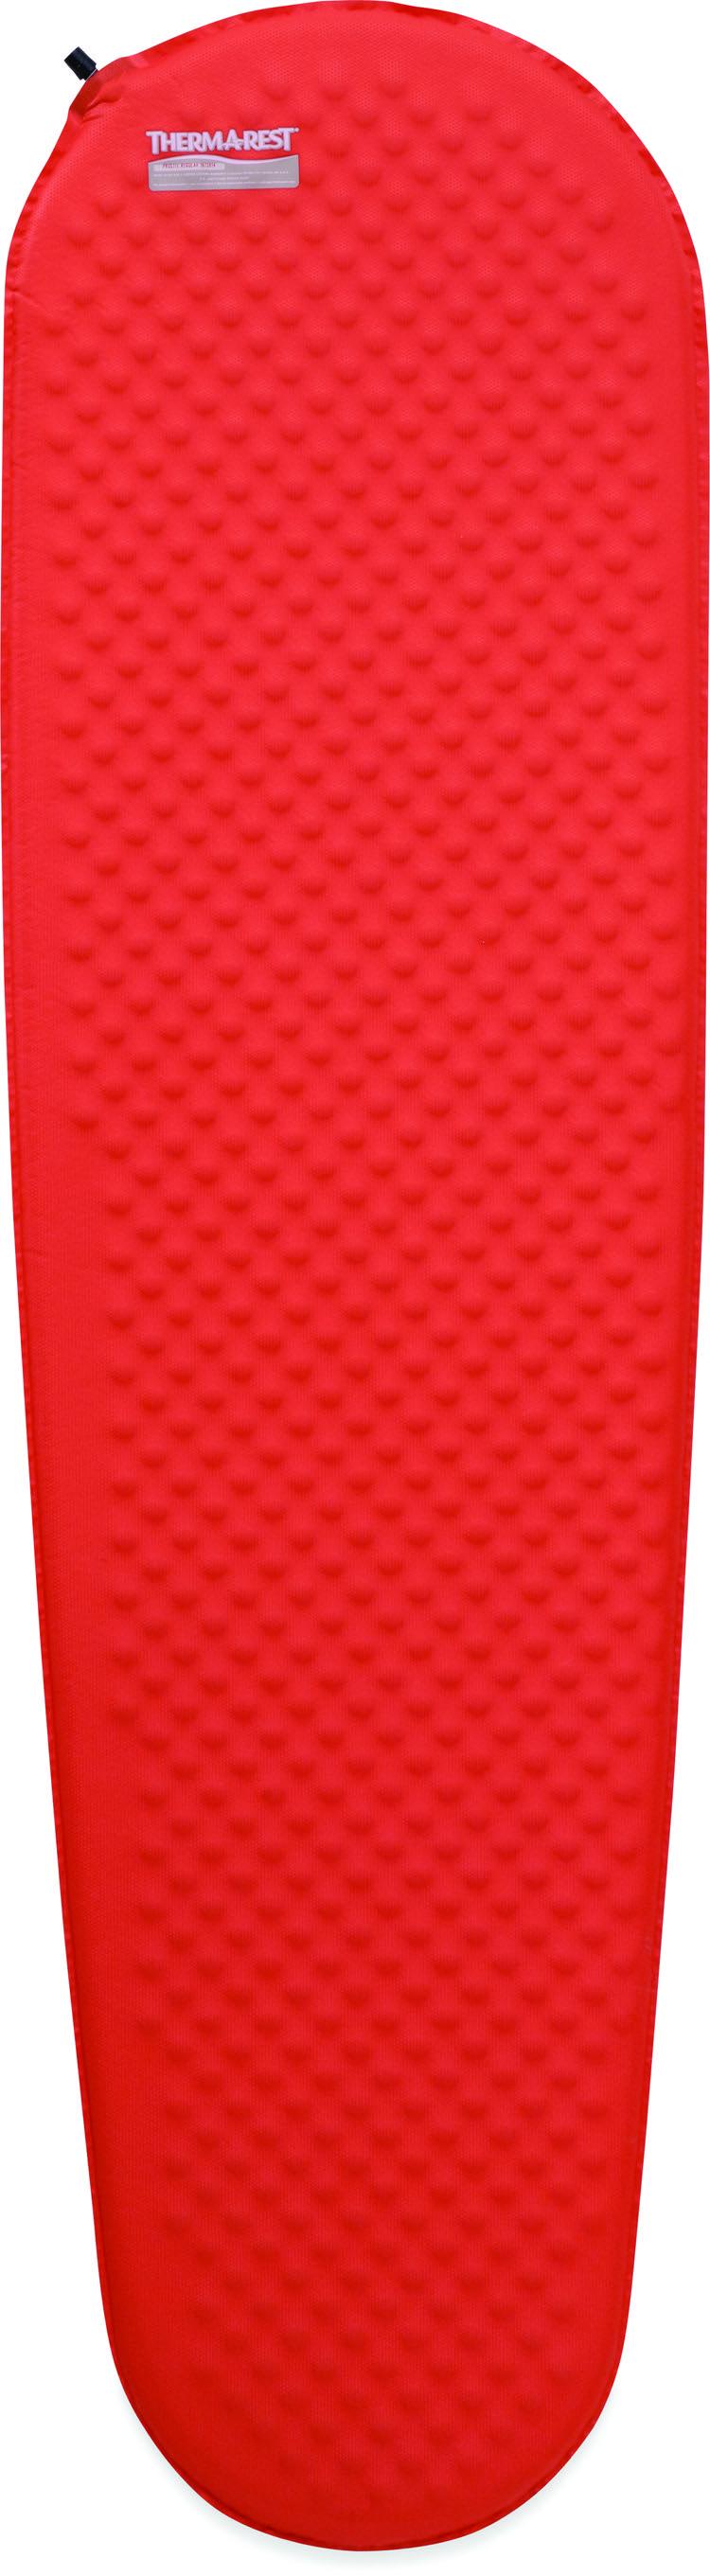 Thermarest ProLite Regular - Matelas auto-gonflant